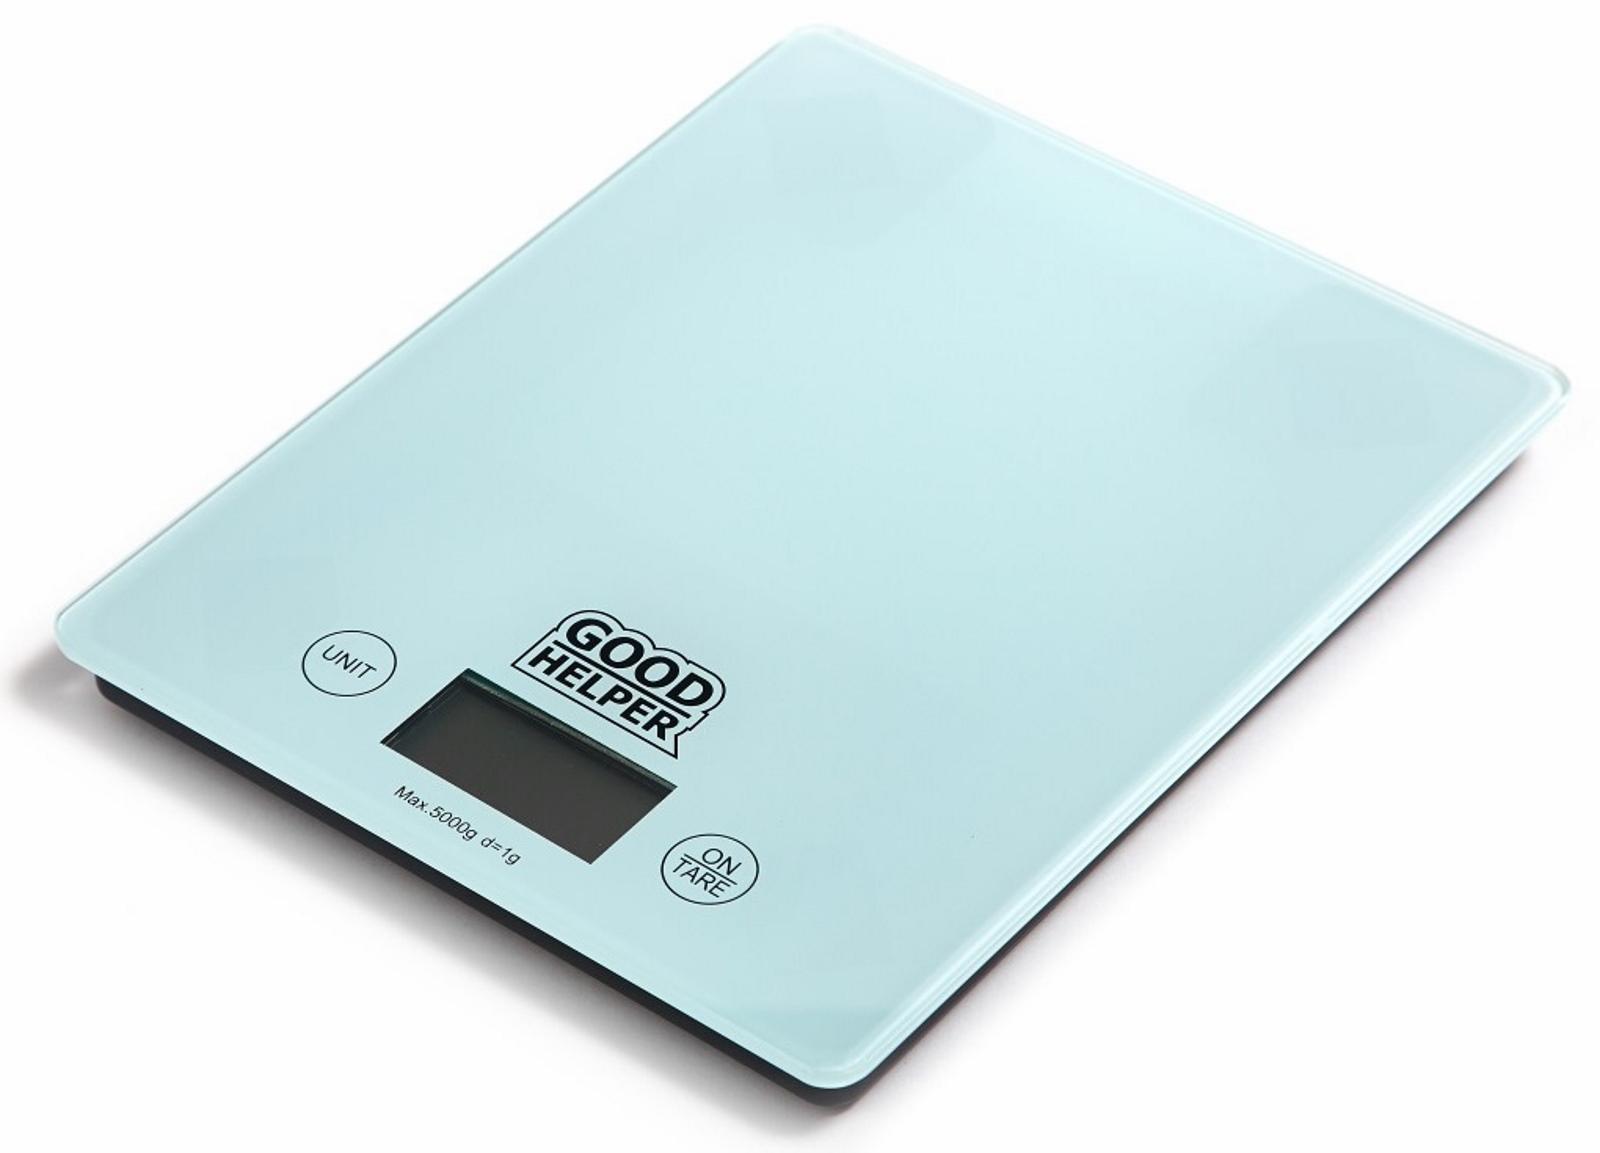 Кухонные весы GOODHELPER Весы кухонные KS-S04, голубой кухонные весы goodhelper ks s04 гол